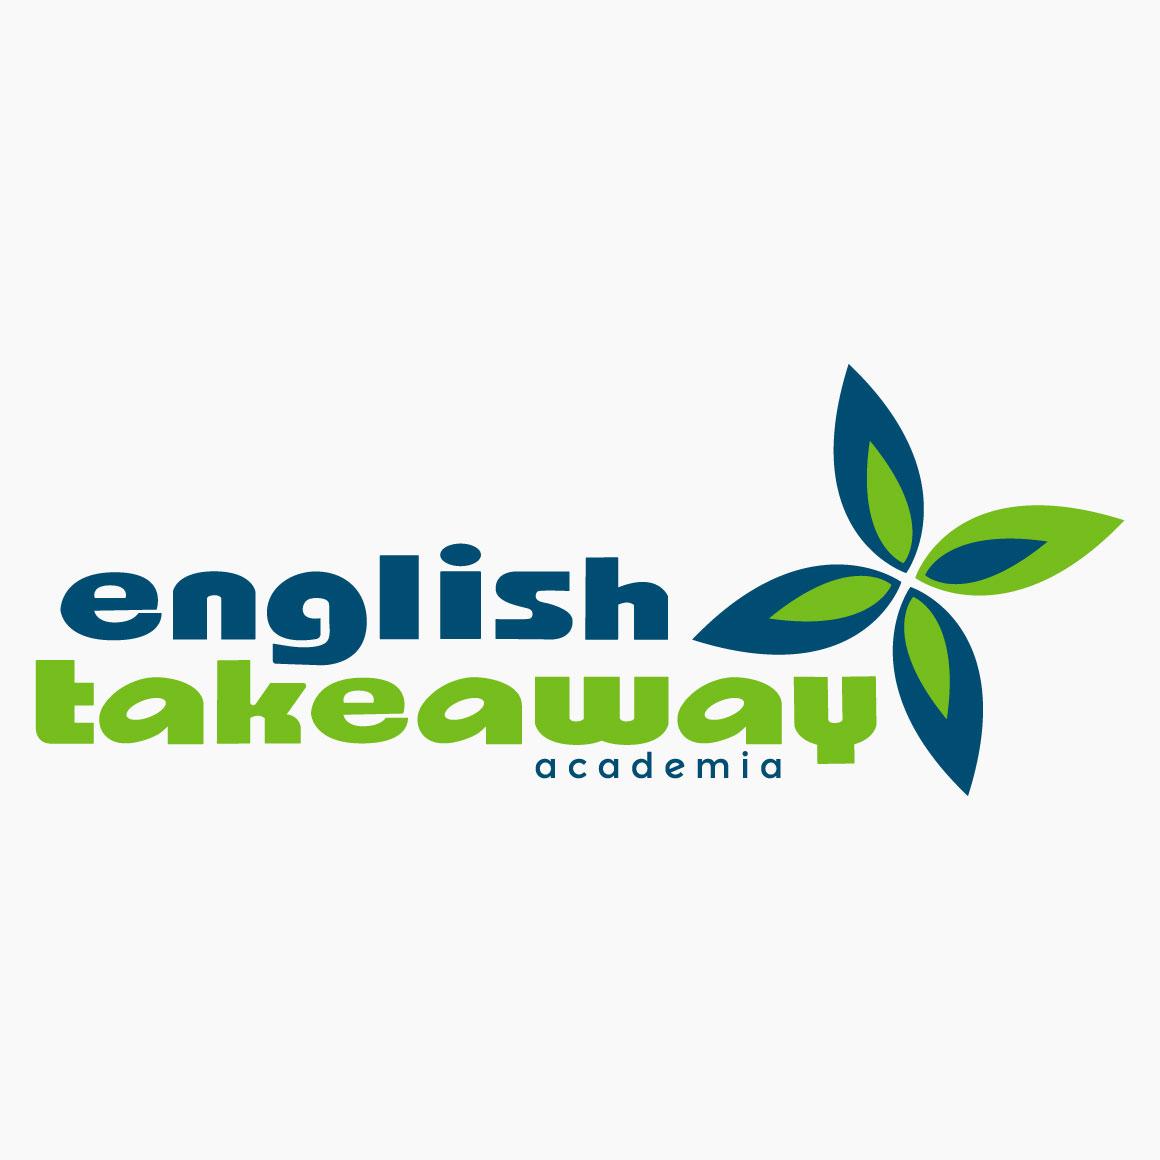 10a.-Imagen-destacada-Englis-Takeaway